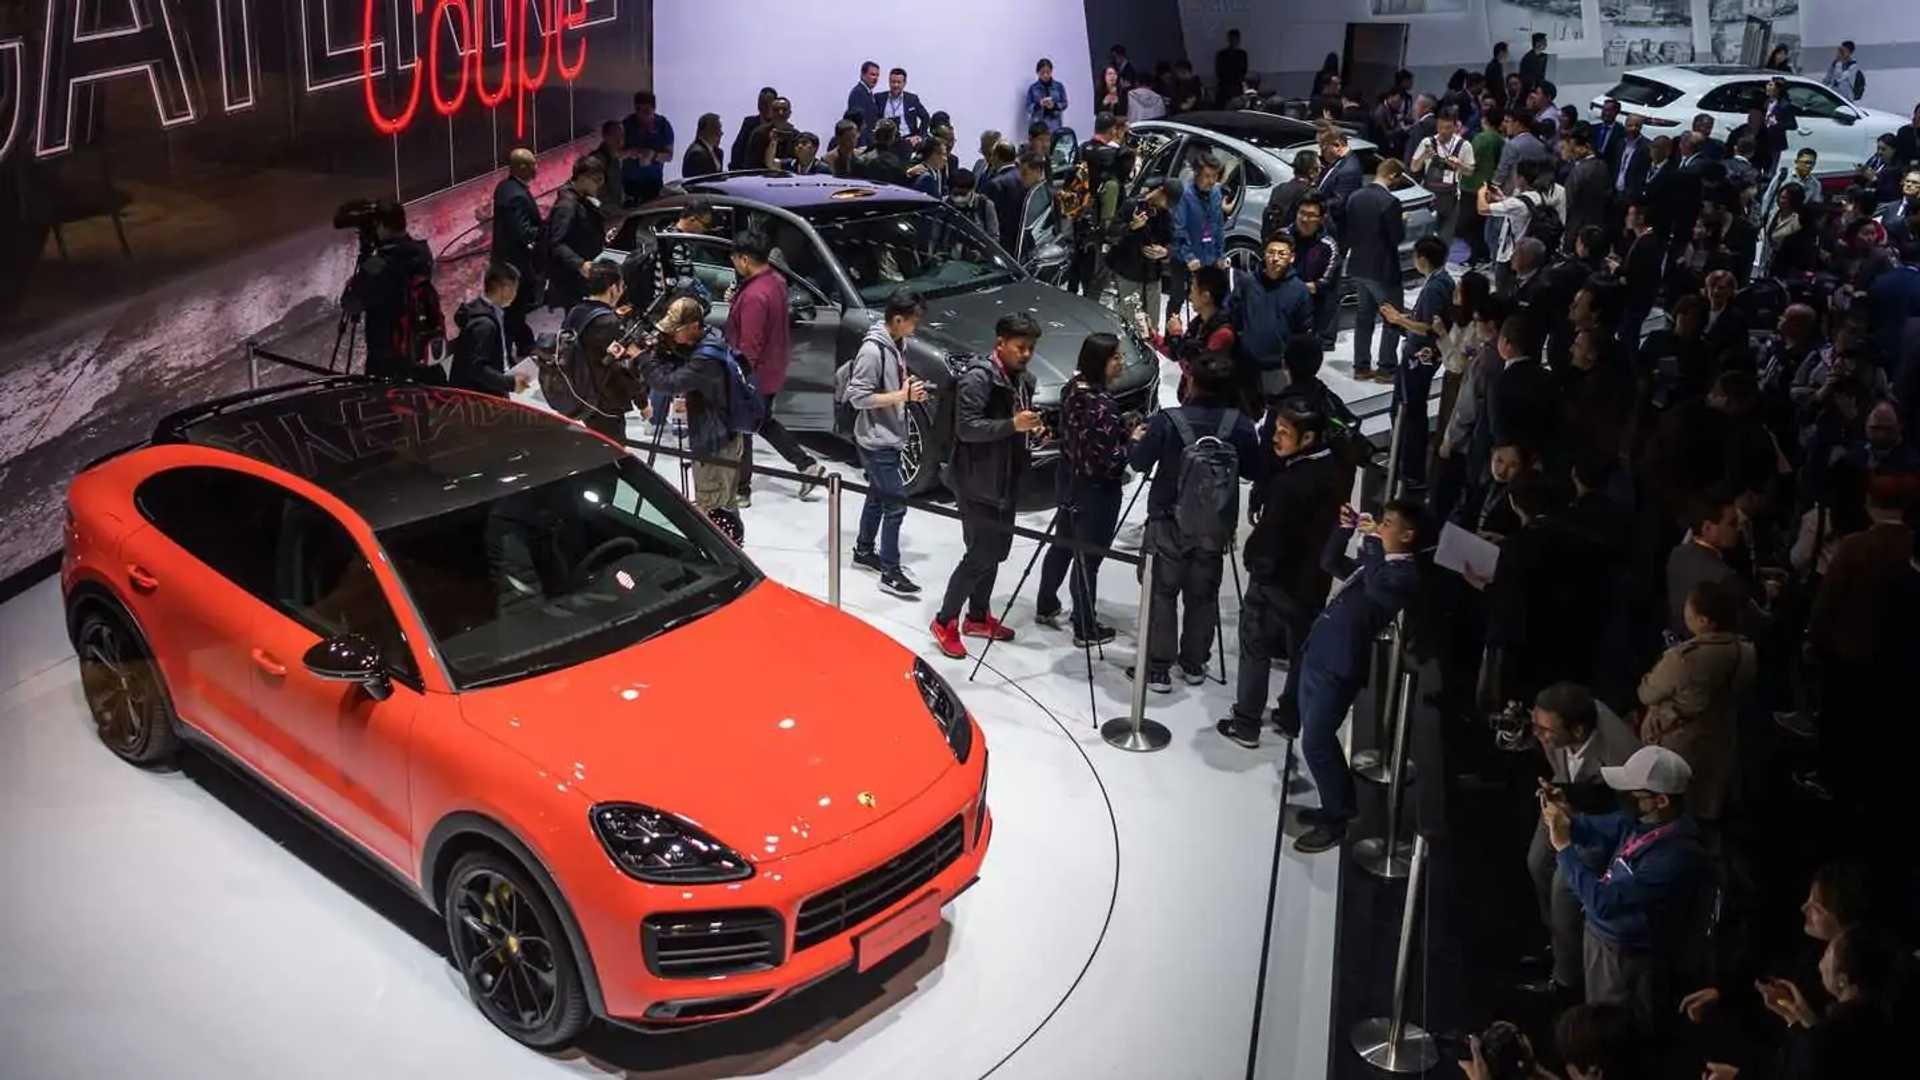 Porsche Cayenne Coupe at Auto Shanghai 2019